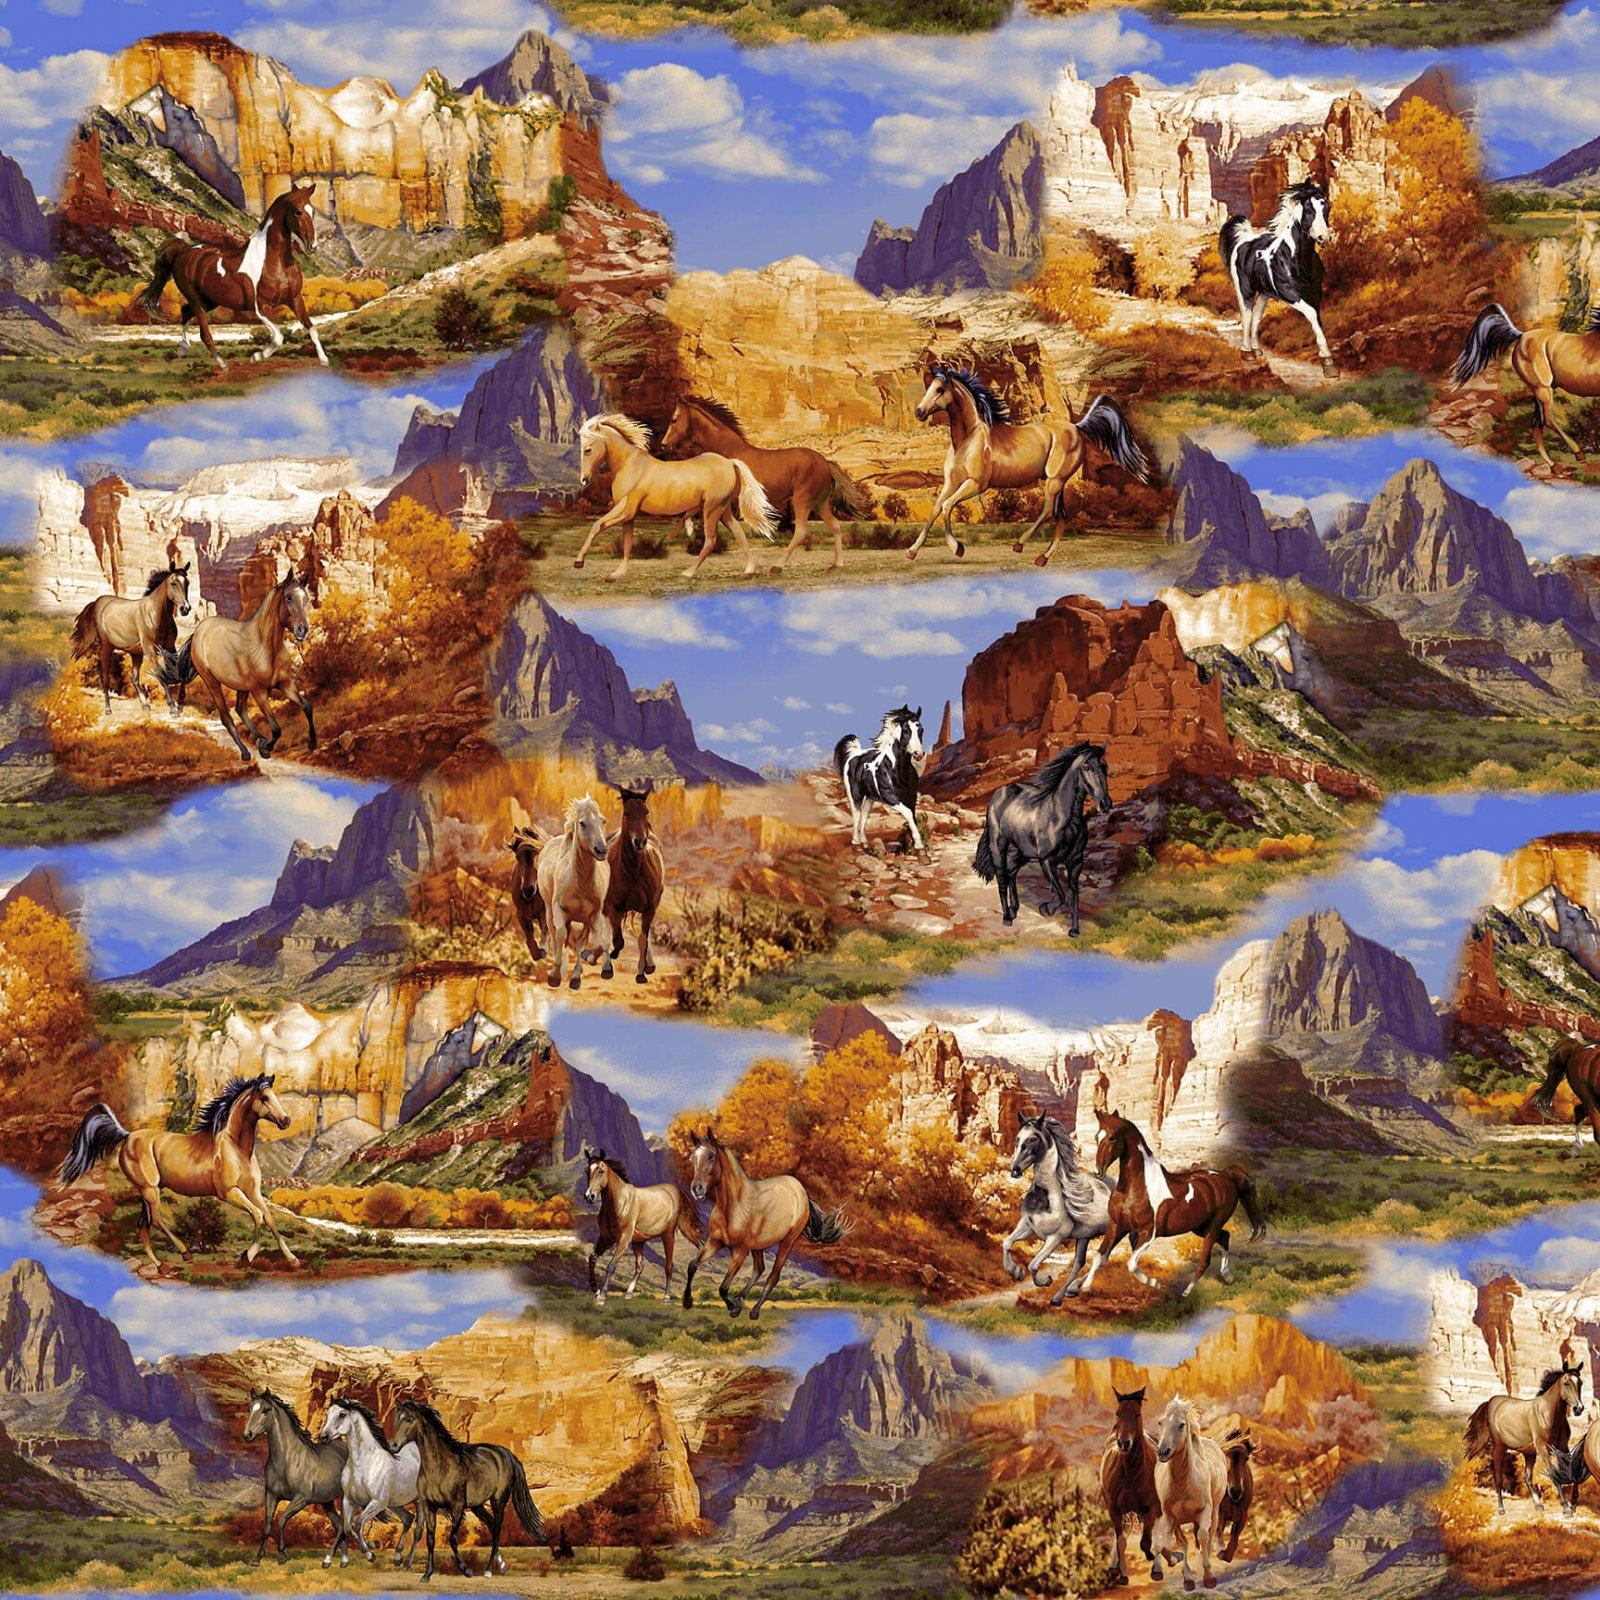 Wild Wild West 5347-38 Horse Canyon Scenic